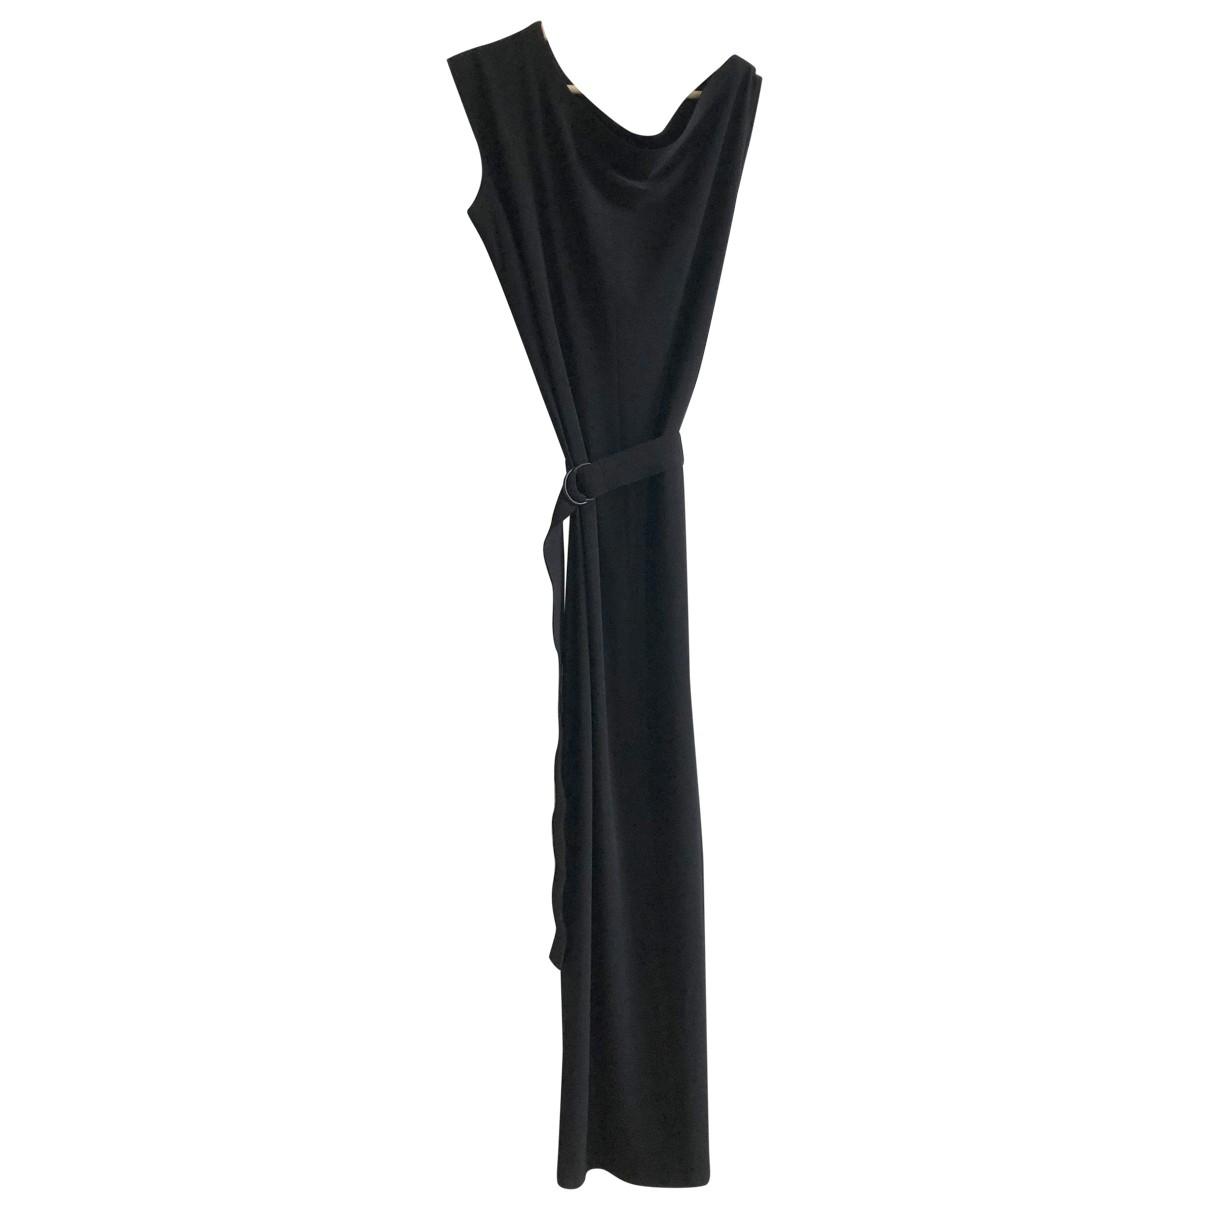 Norma Kamali \N Kleid in  Schwarz Polyester